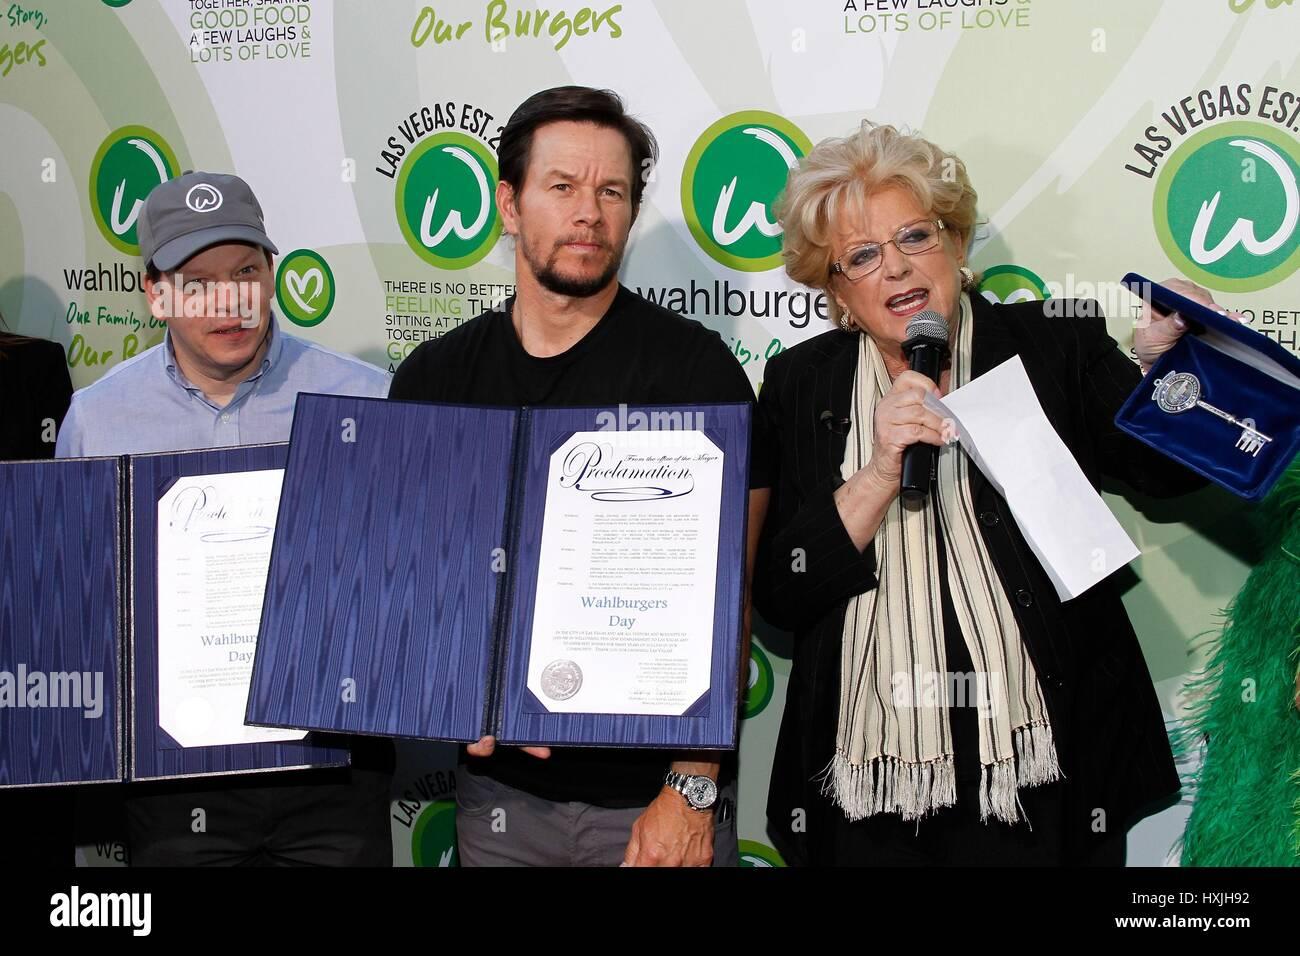 Las Vegas, NV, Stati Uniti d'America. 28 Mar, 2017. Paolo Wahlberg, Mark Wahlberg, Caroline Goodman (Sindaco Immagini Stock